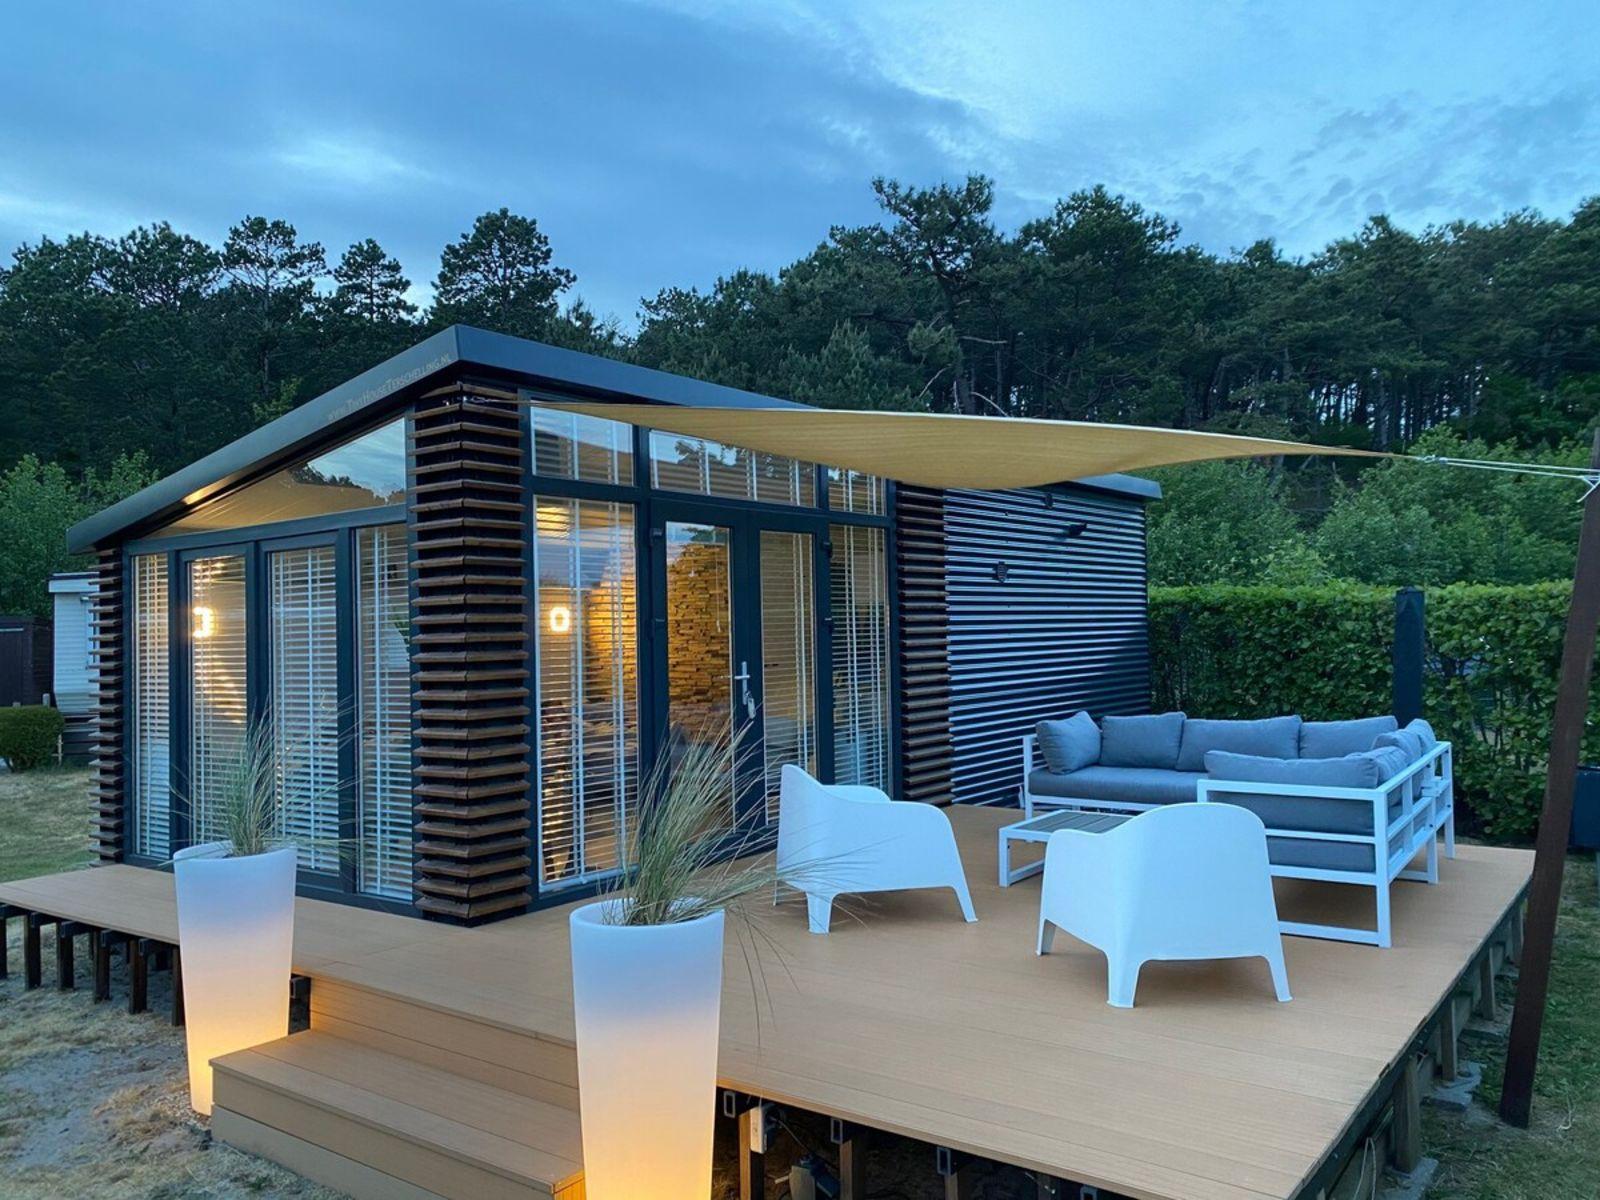 airbnb, Partner, TinyHouseTerschelling